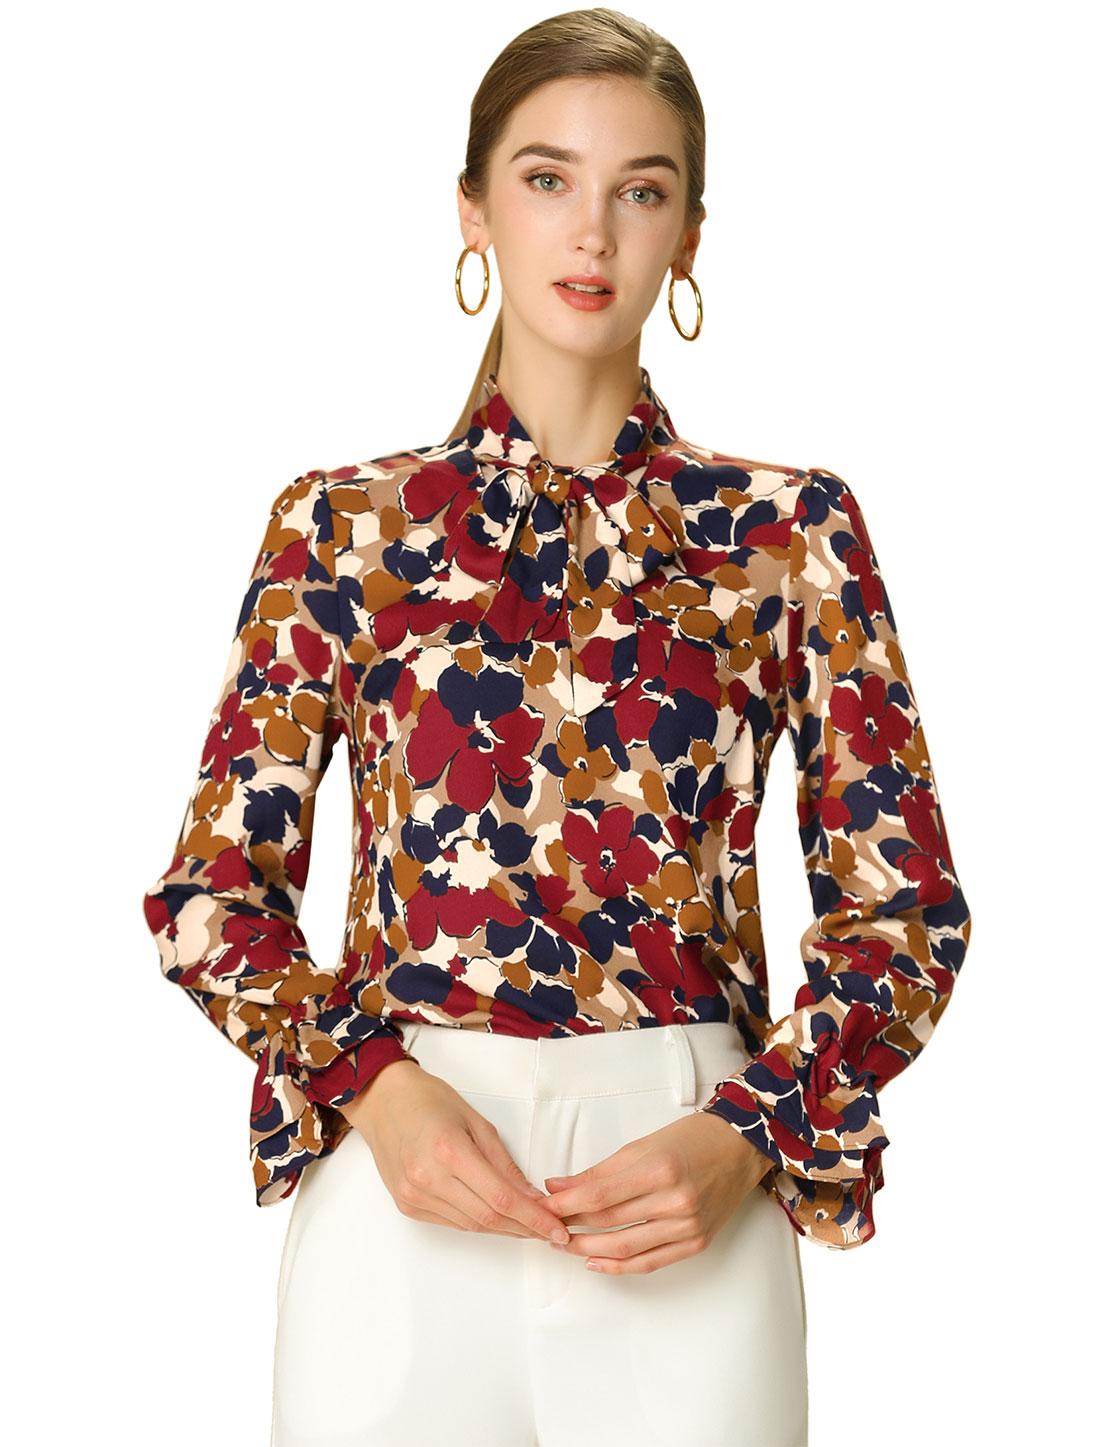 Allegra K Women's Tie Neck Long Sleeve Floral Shirt Red L (US 14)